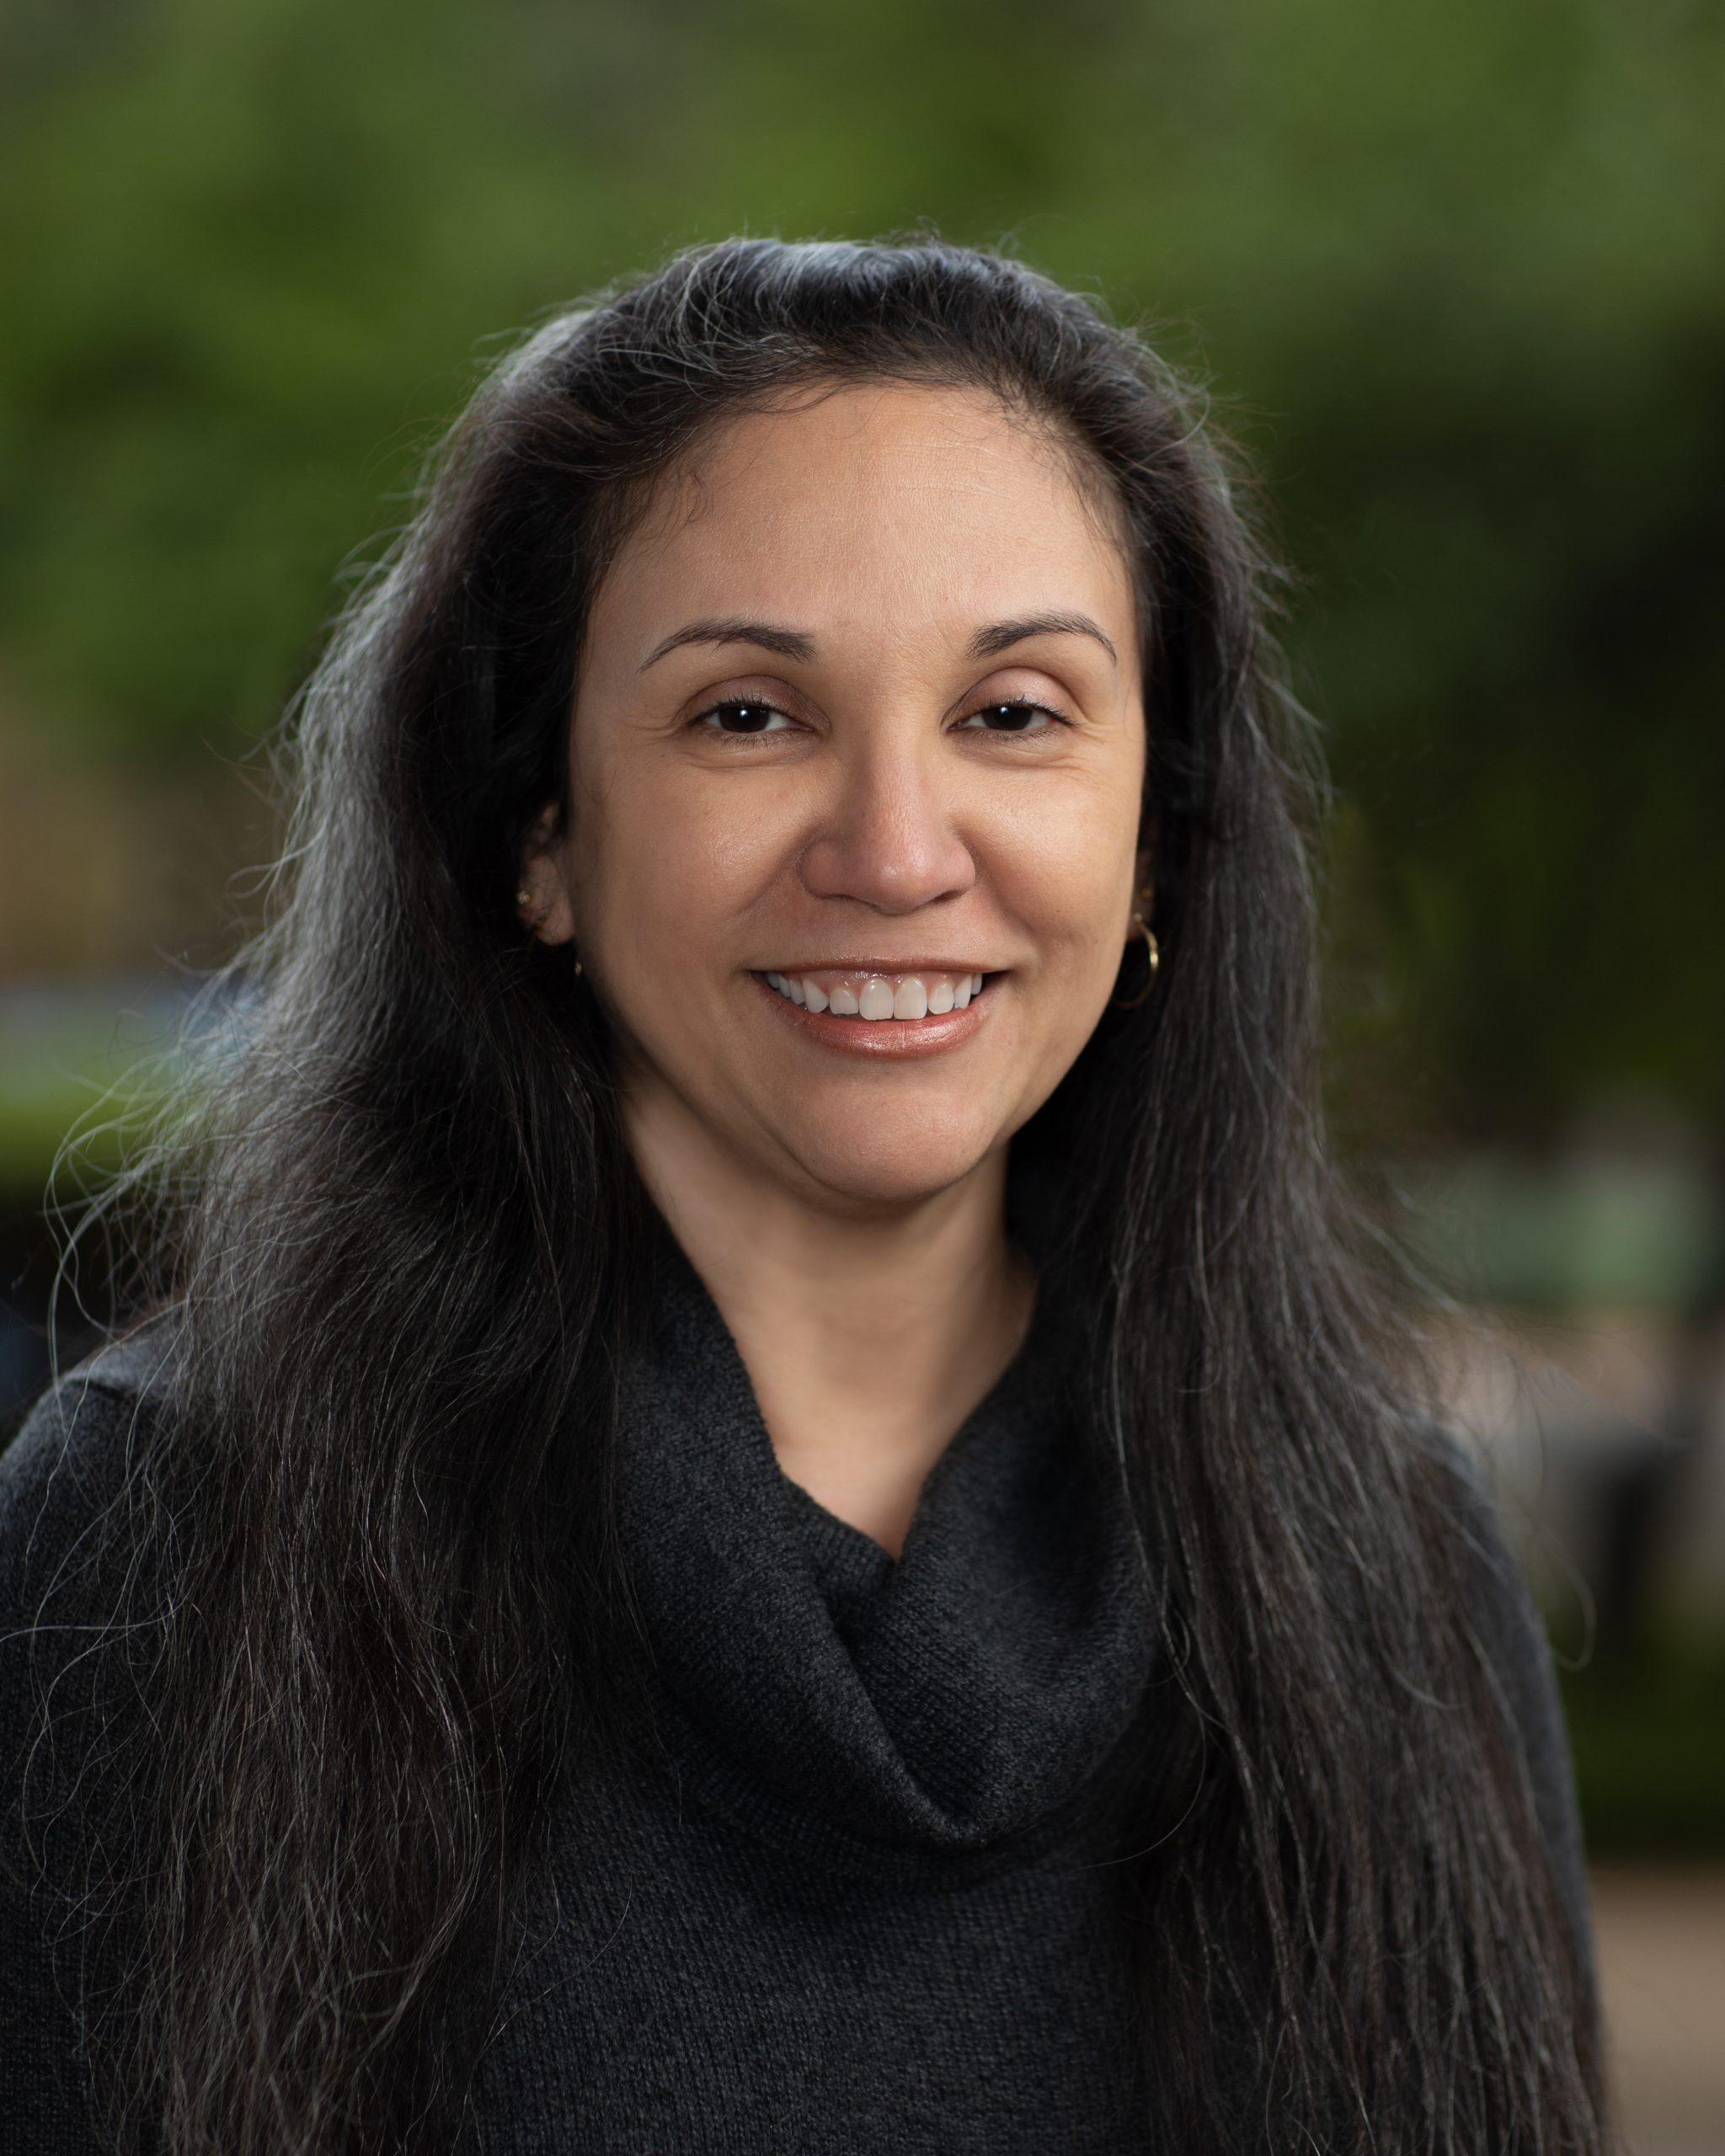 Rolee Rios, HDO Senior Academic Program Coordinator